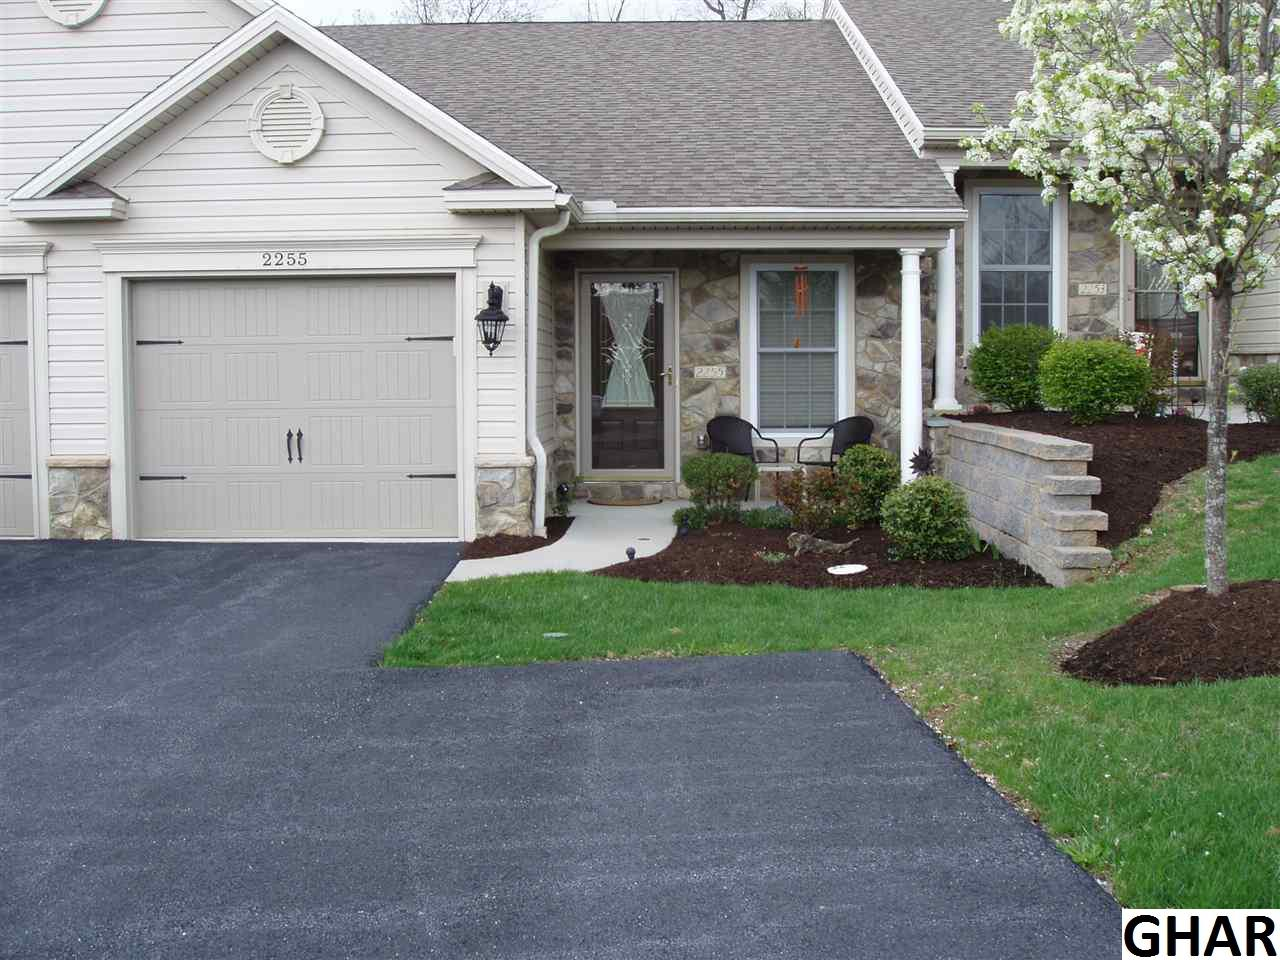 Rental Homes for Rent, ListingId:33053093, location: 2255 Gleim Dr. Enola 17025